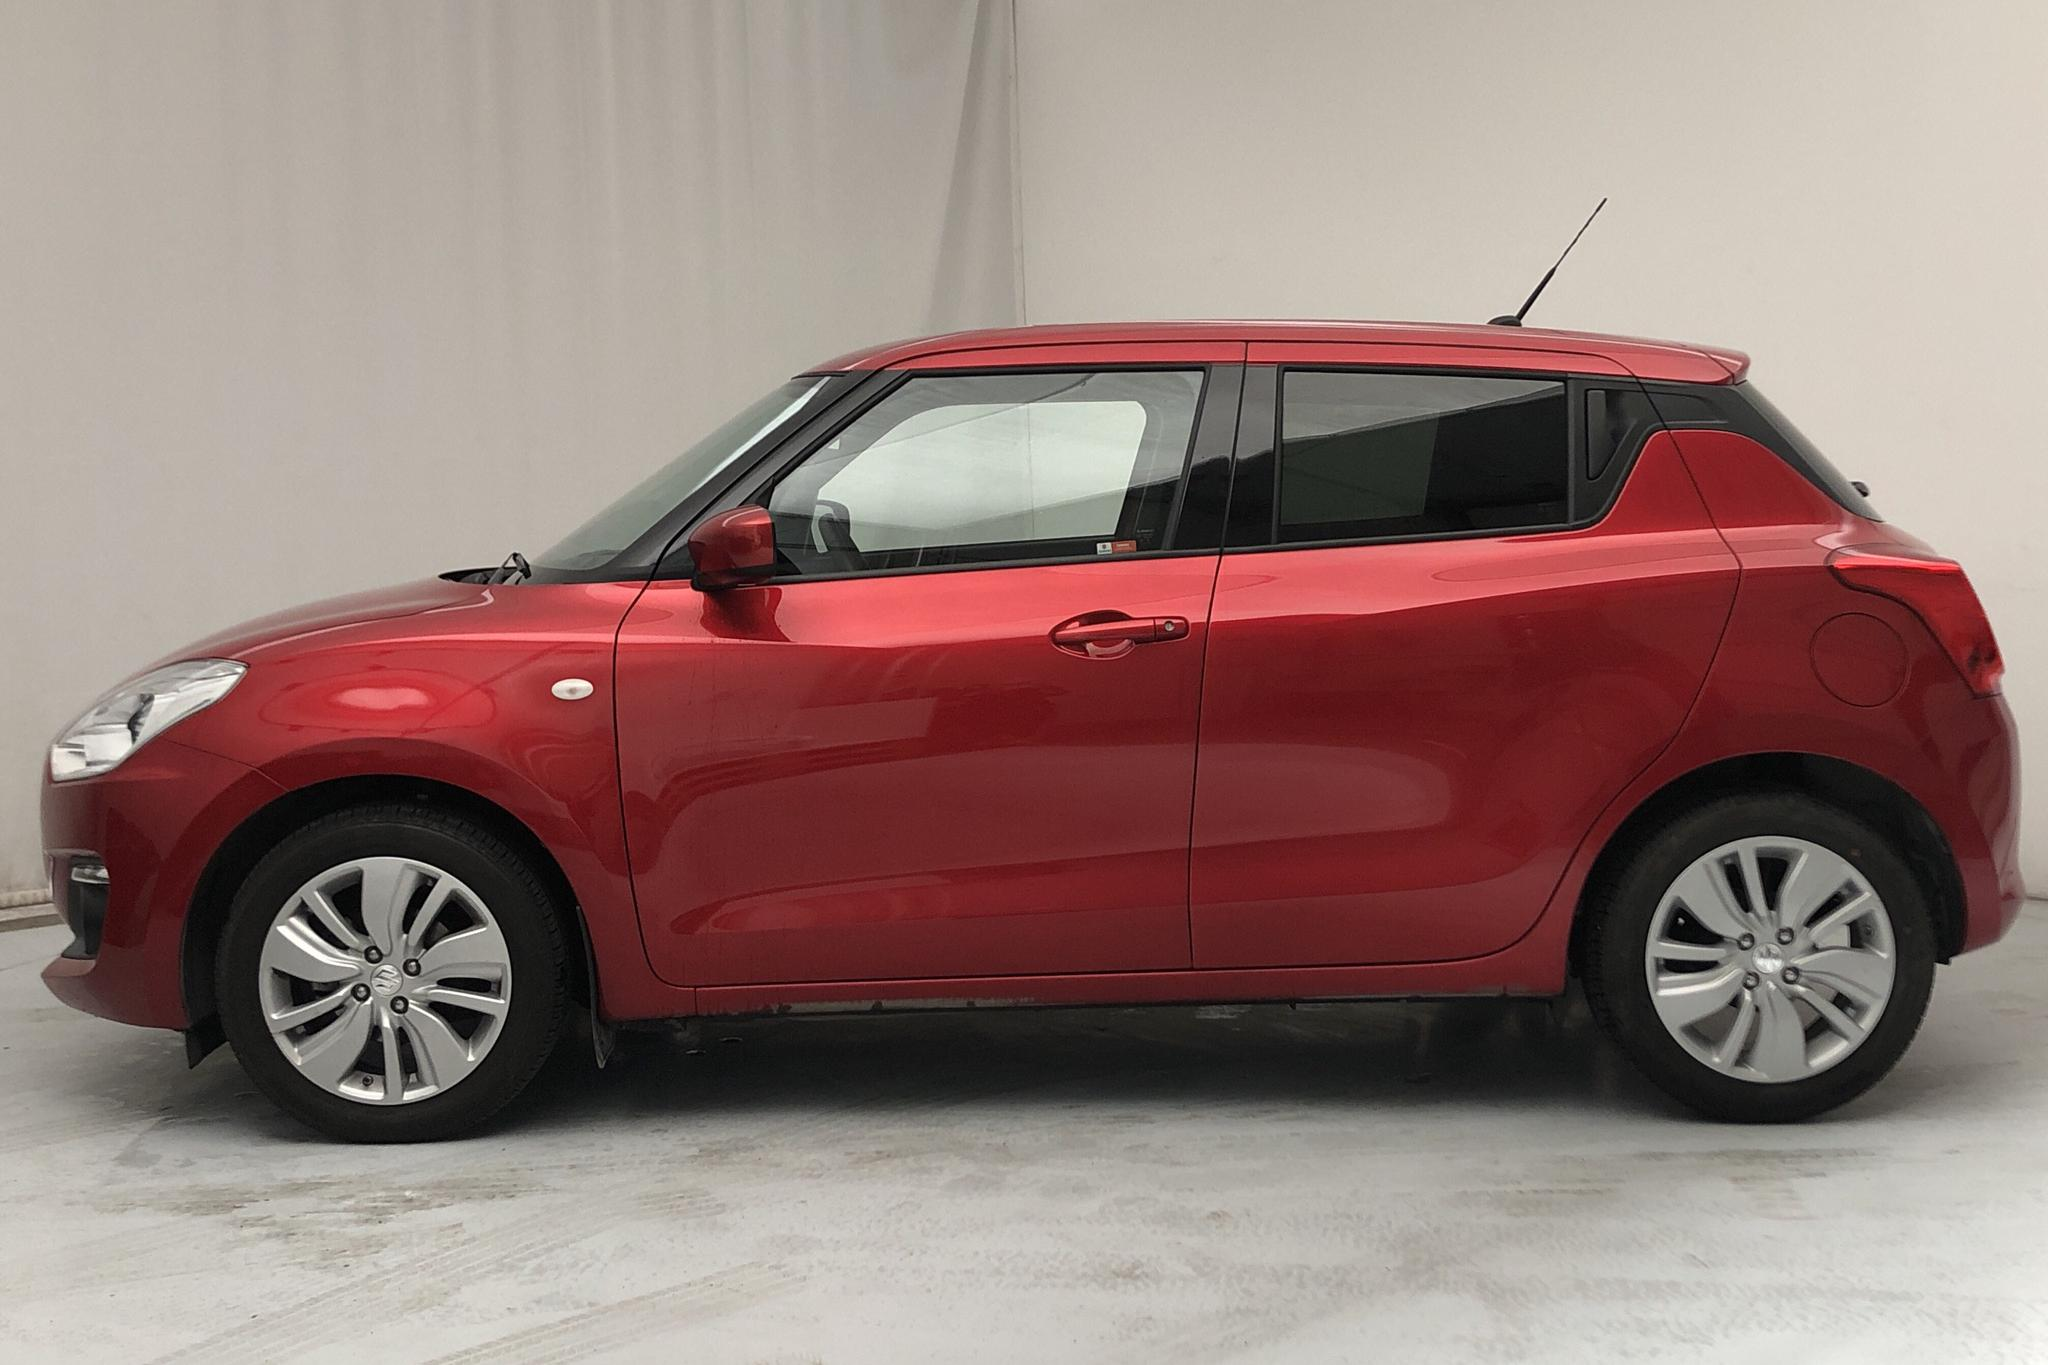 Suzuki Swift 1.2 5dr (90hk) - 14 860 km - Manual - red - 2018